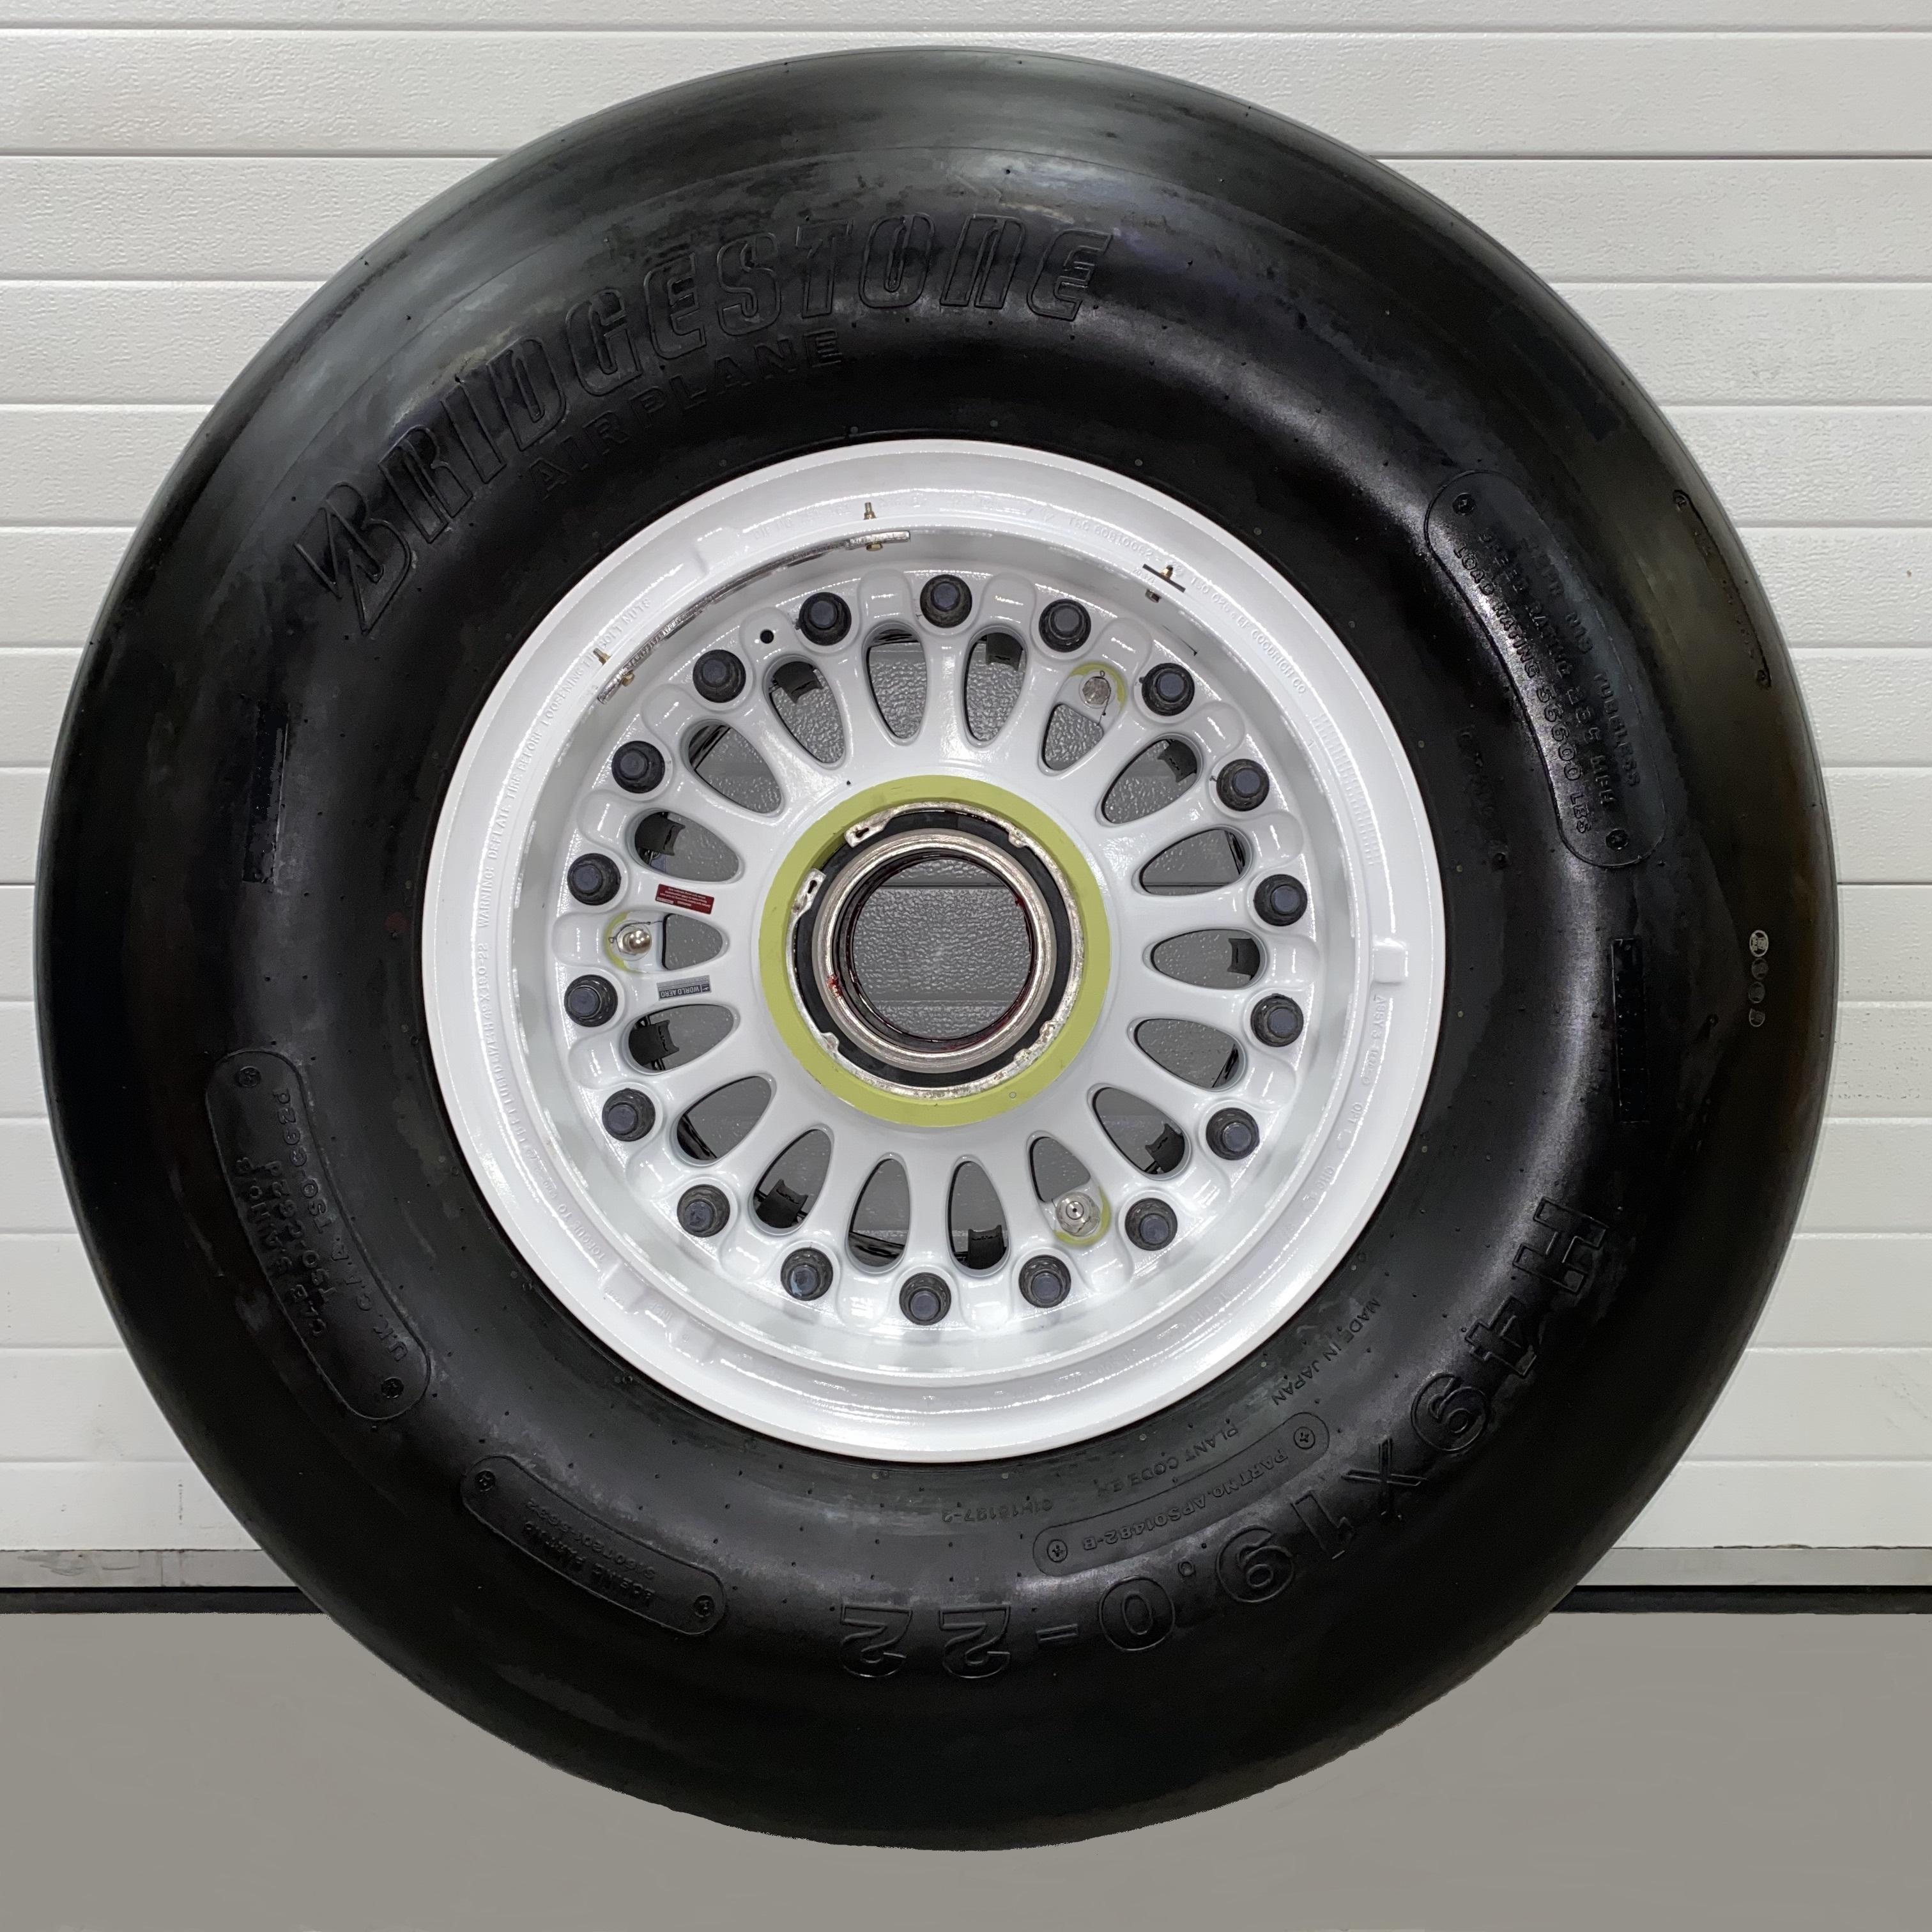 168U0100-52 Boeing 747-400 wheel & tire